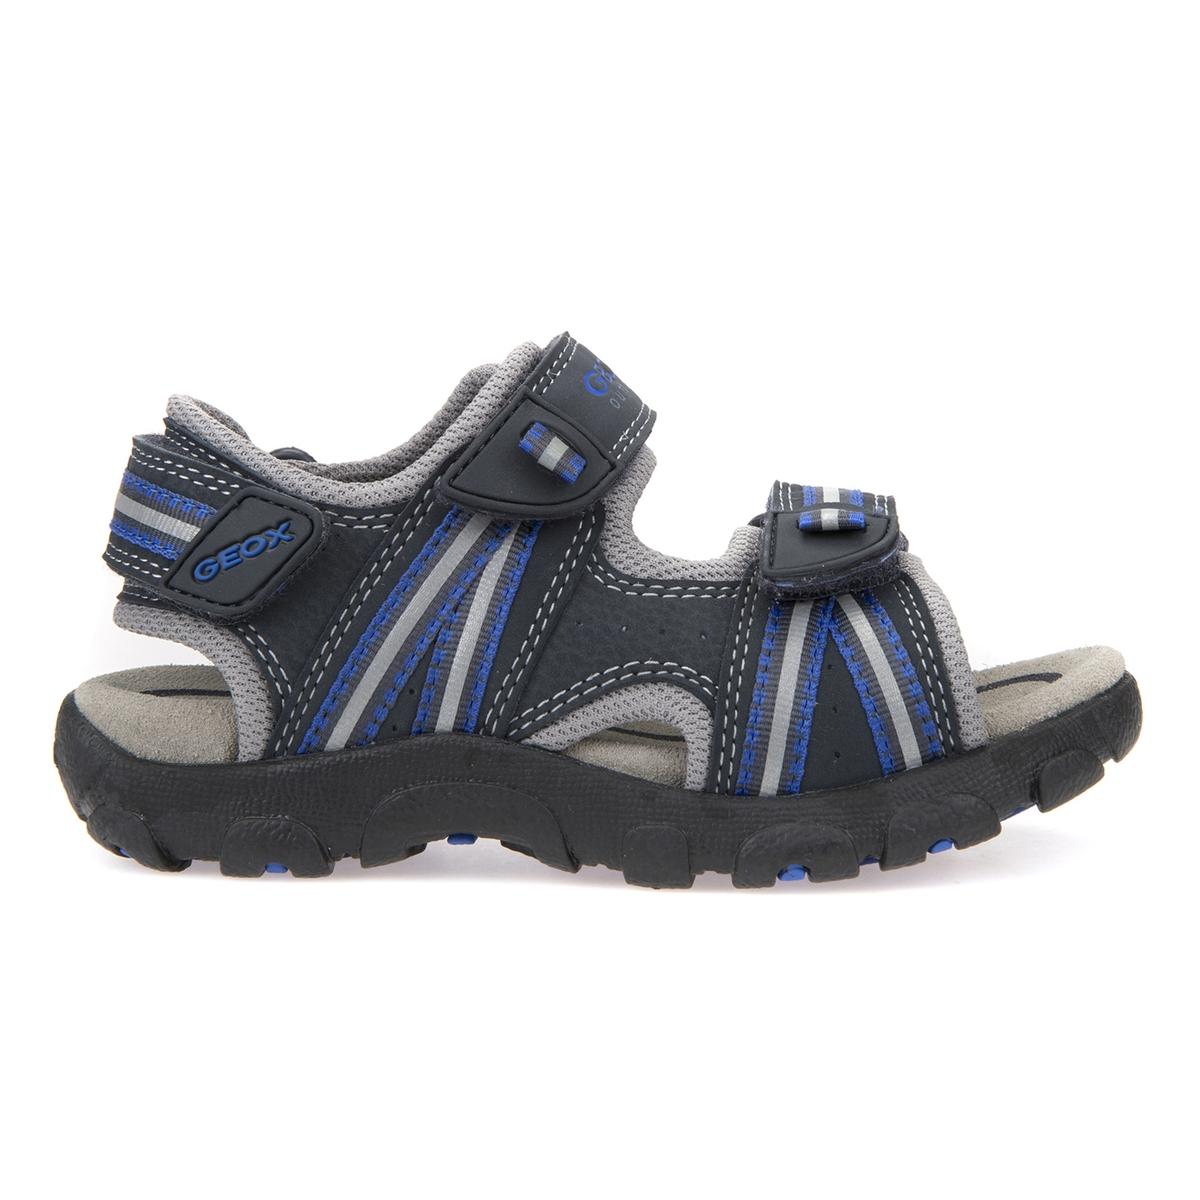 js karly gd sandals